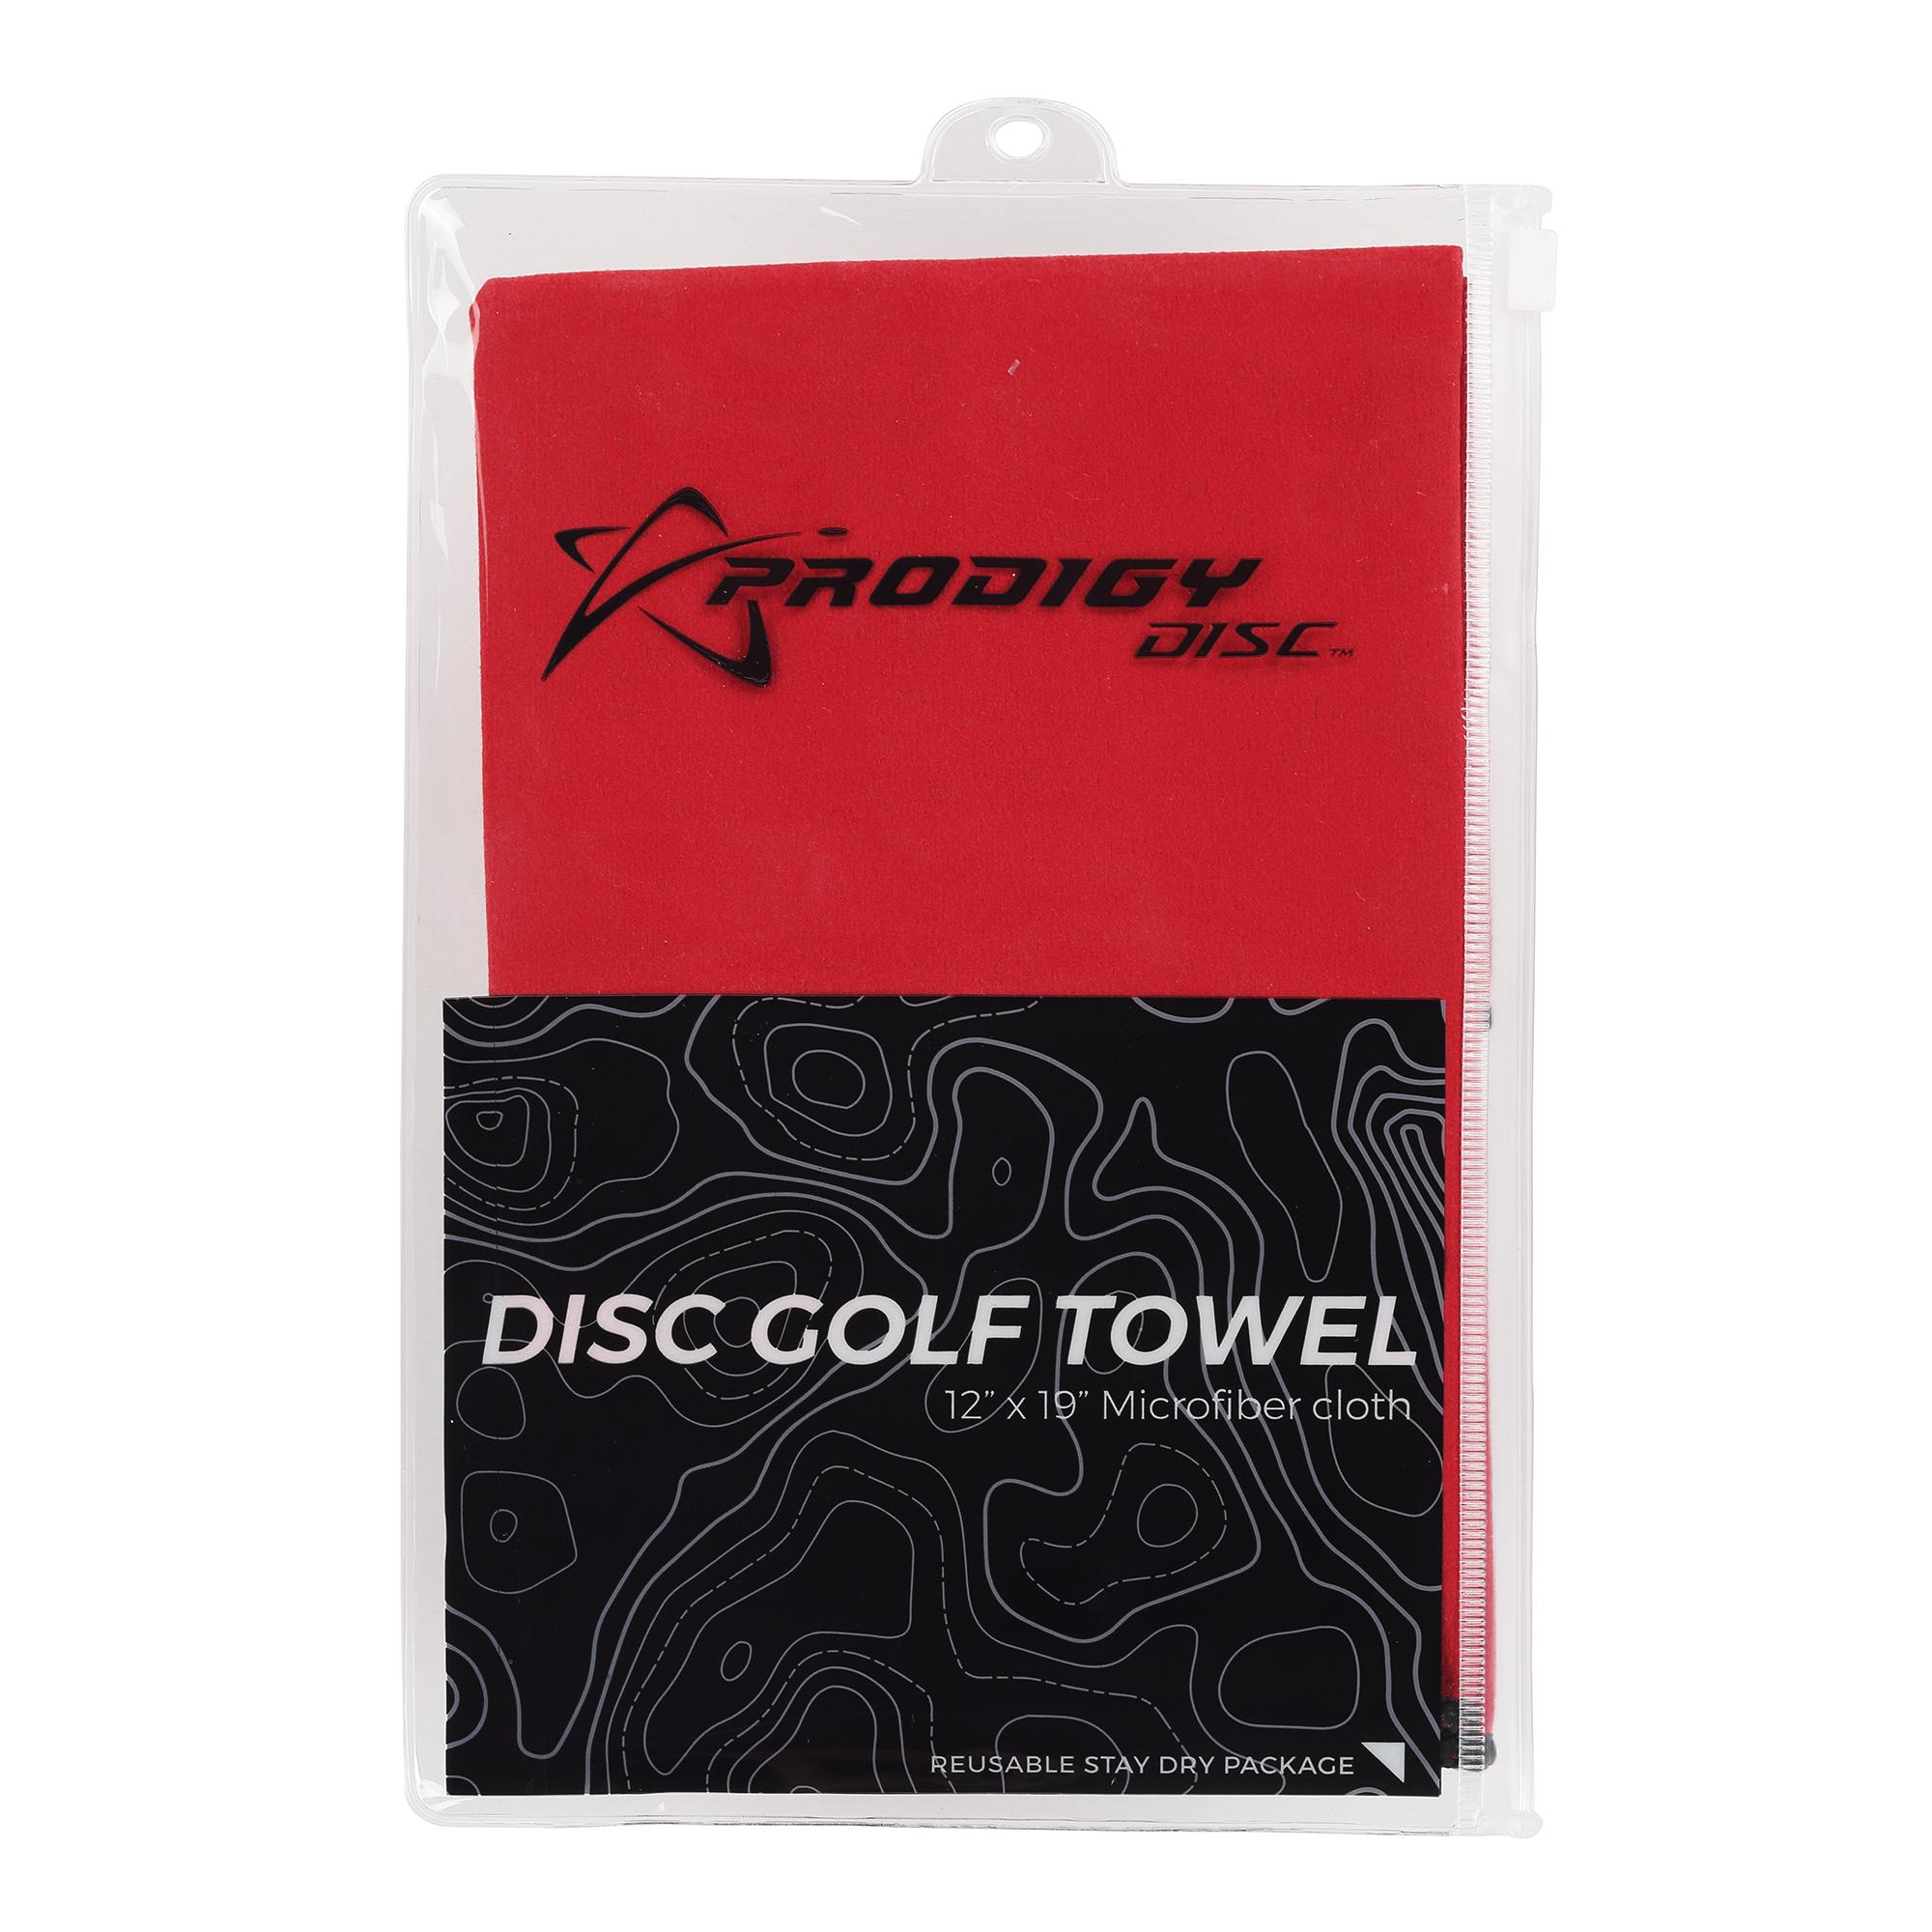 Disc_Golf_Towel_Red_Thumbnail.jpg